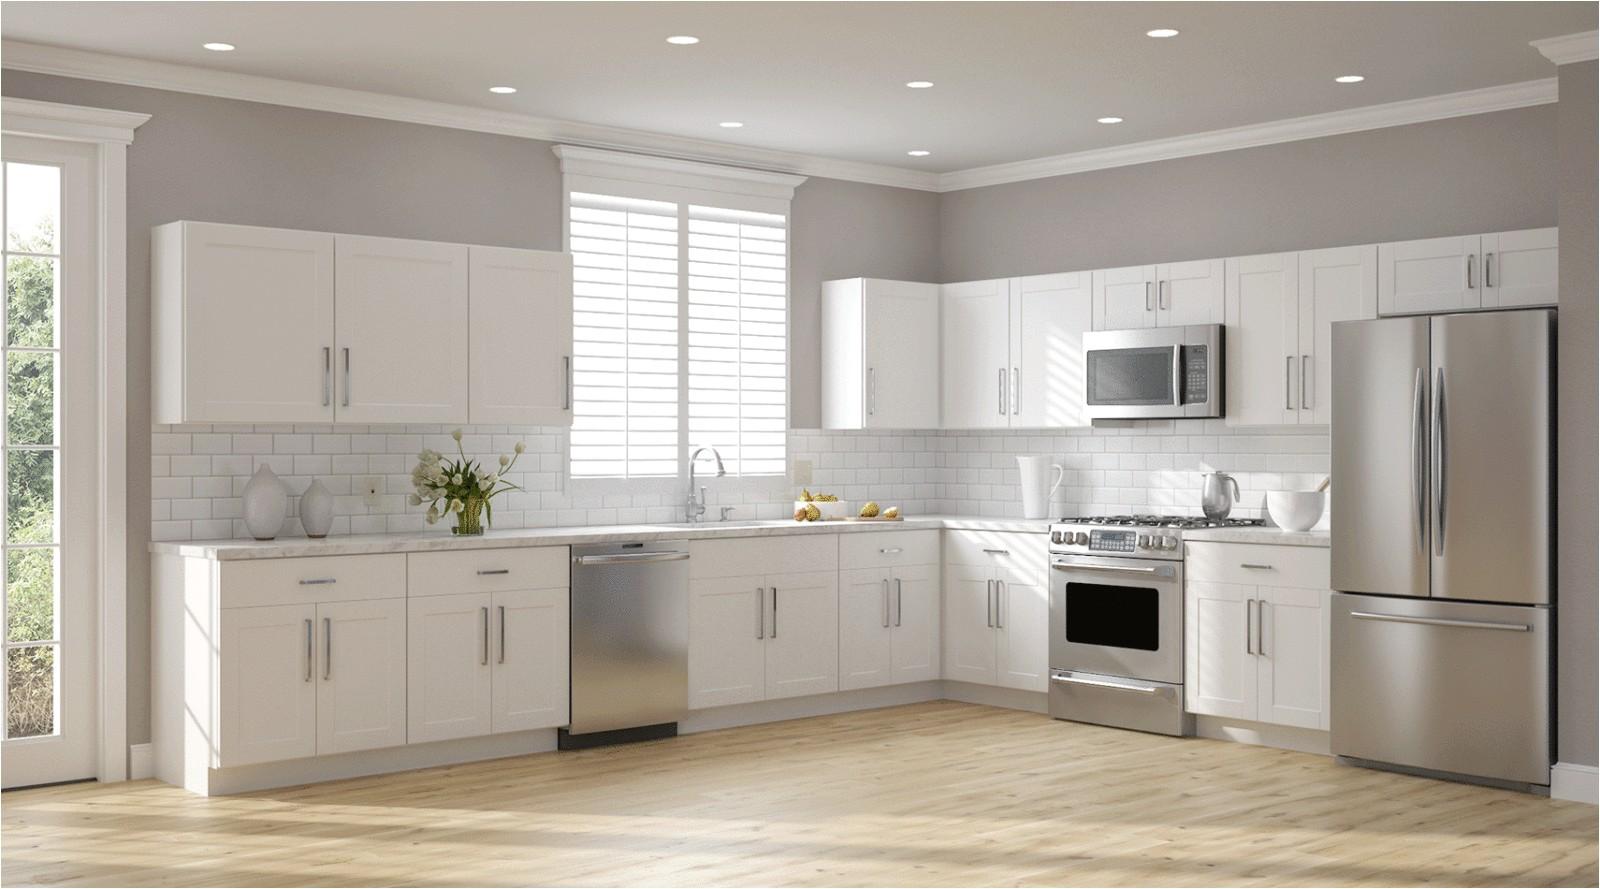 kitchen estimator prices shown are estimated retail prices for hampton bay cabinets